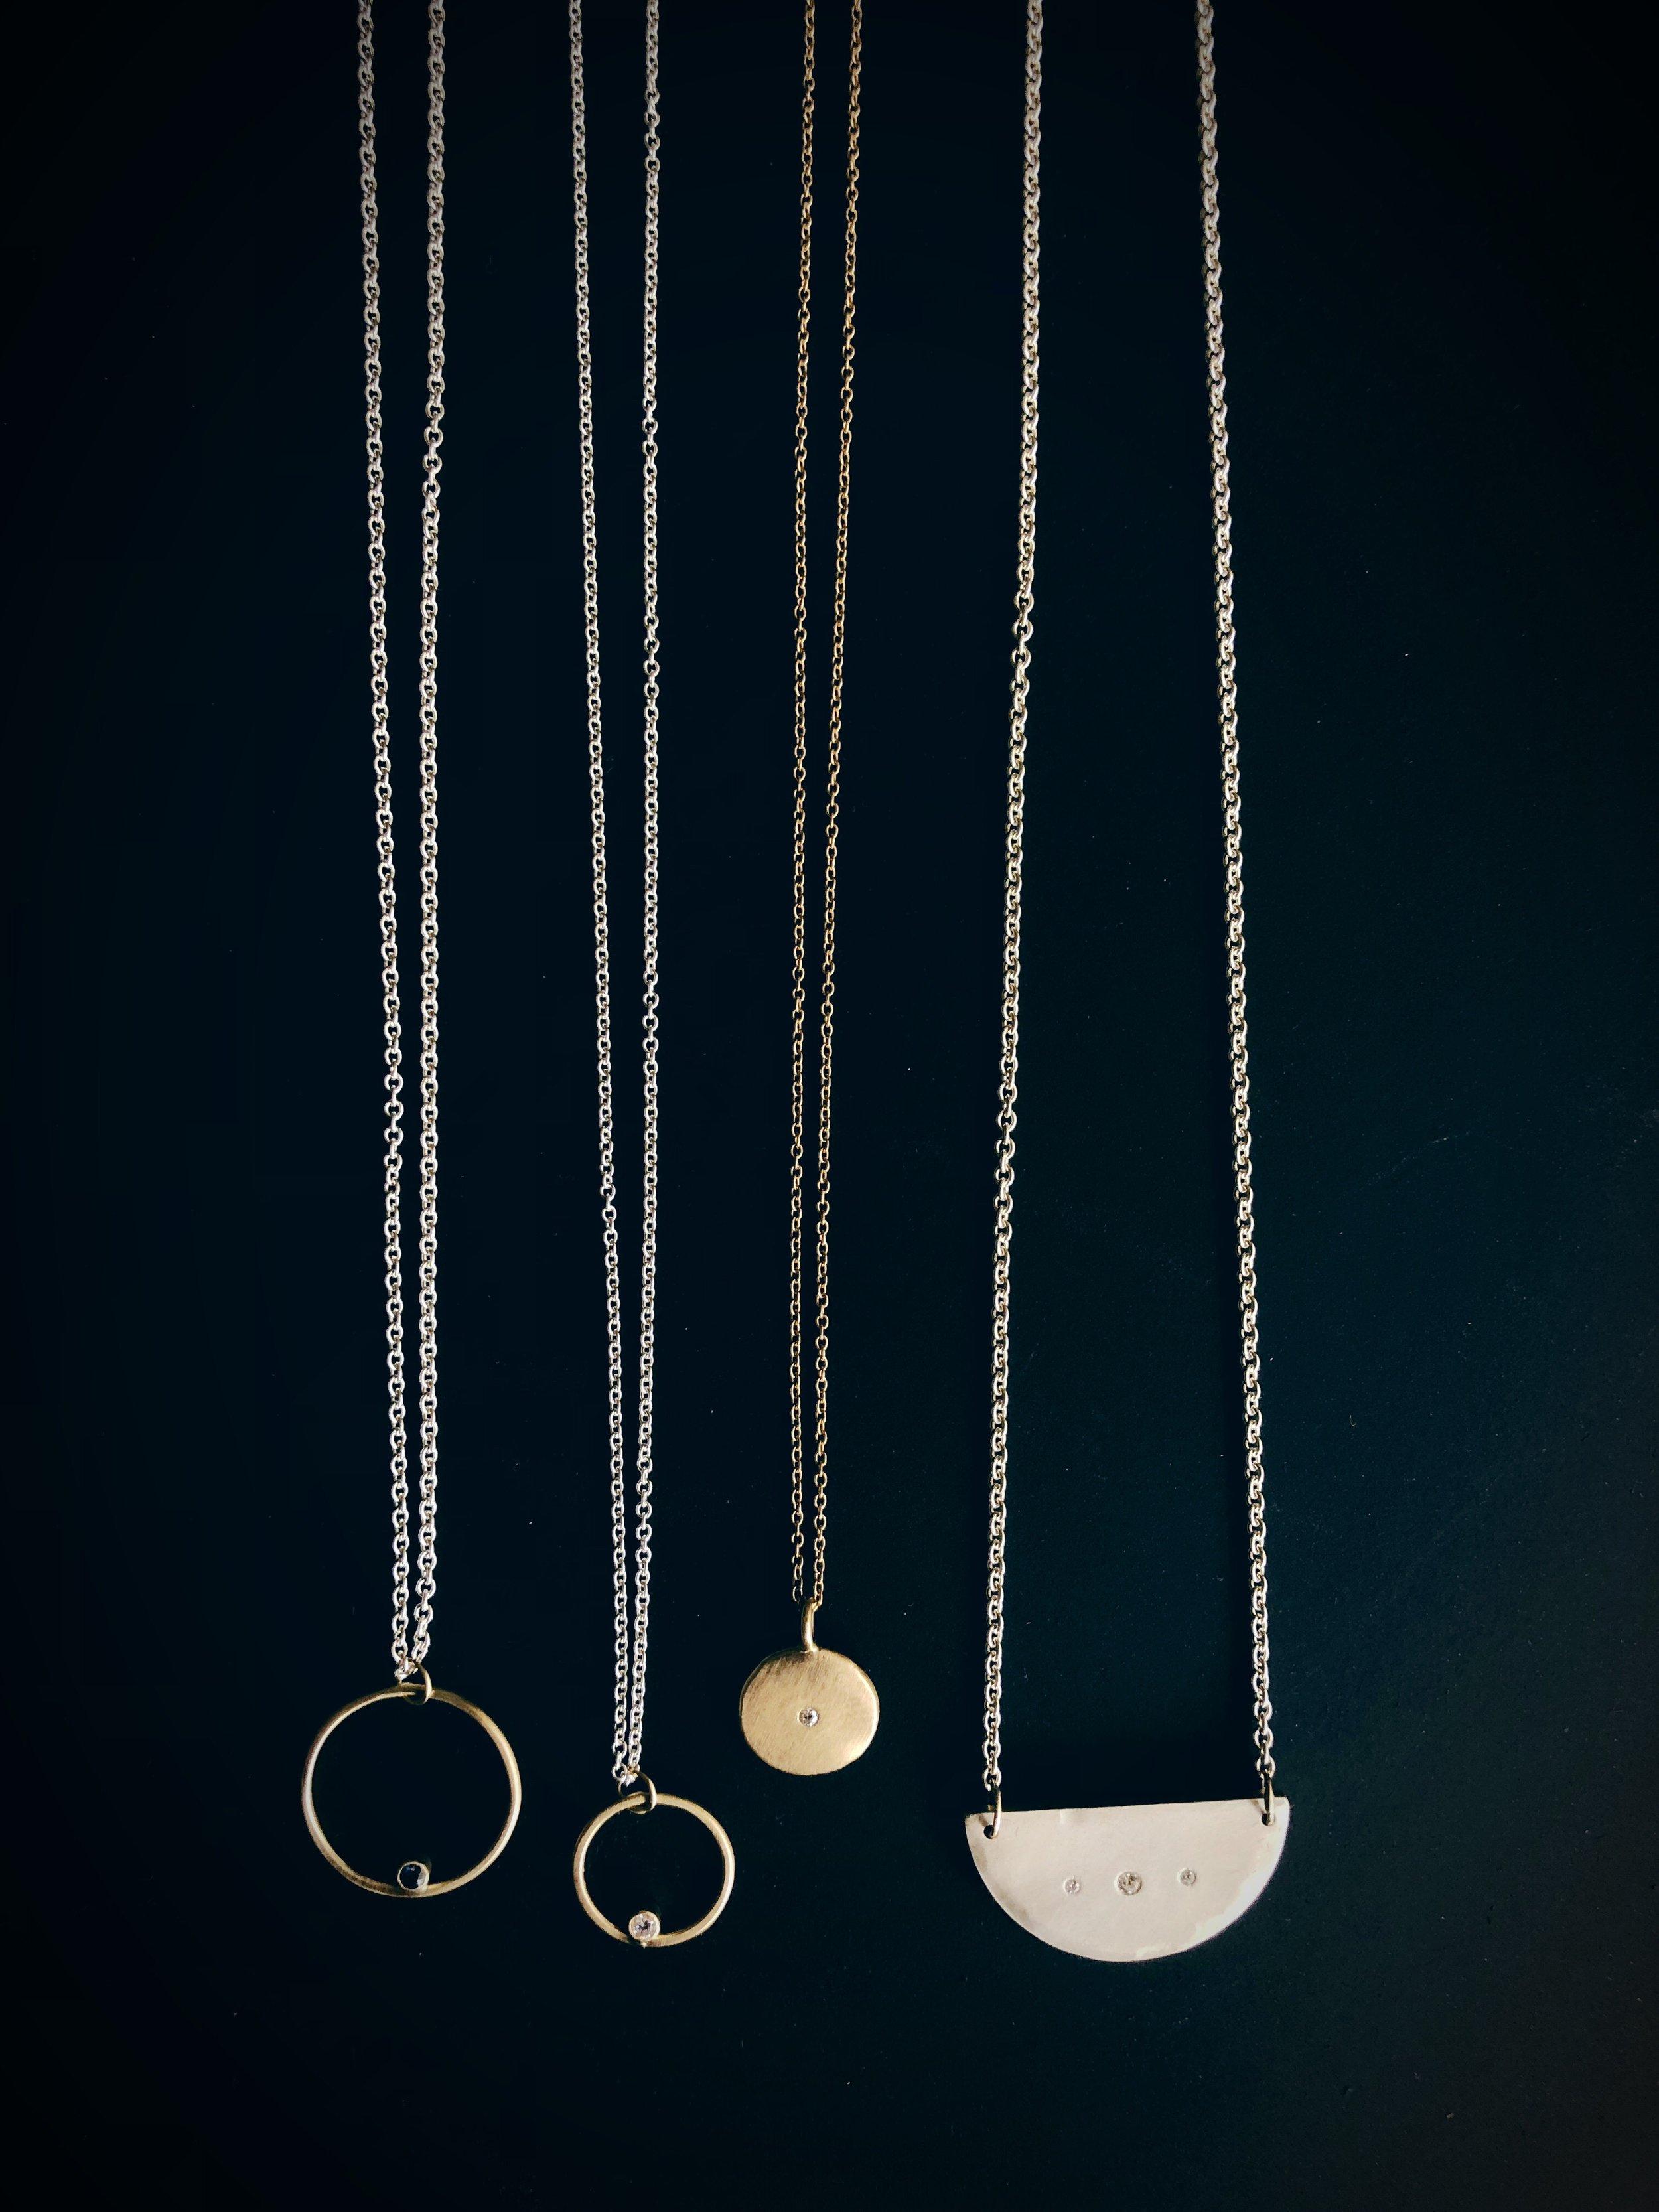 diamond and sapphire necklaces - rebecca mir grady